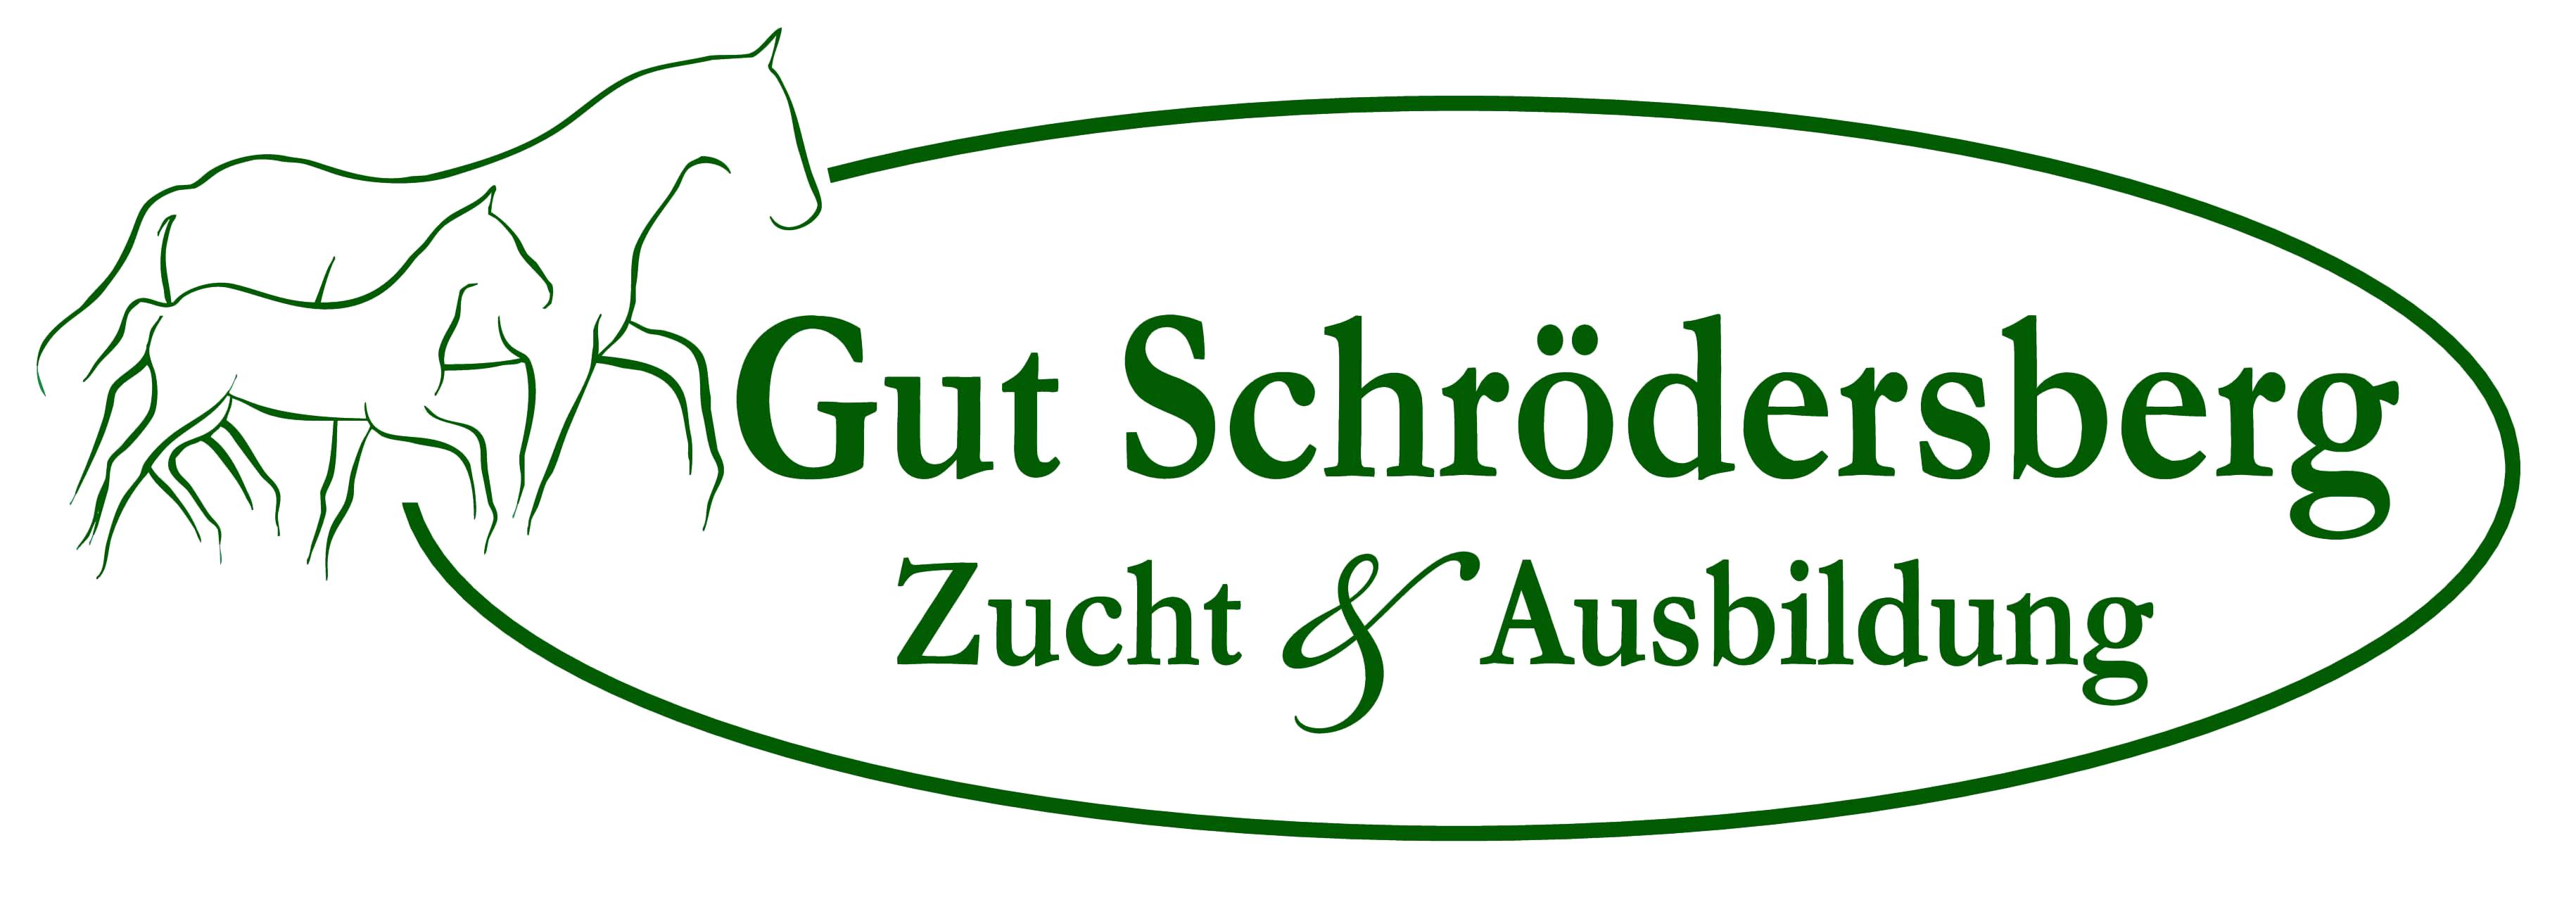 Gut Schrödersberg